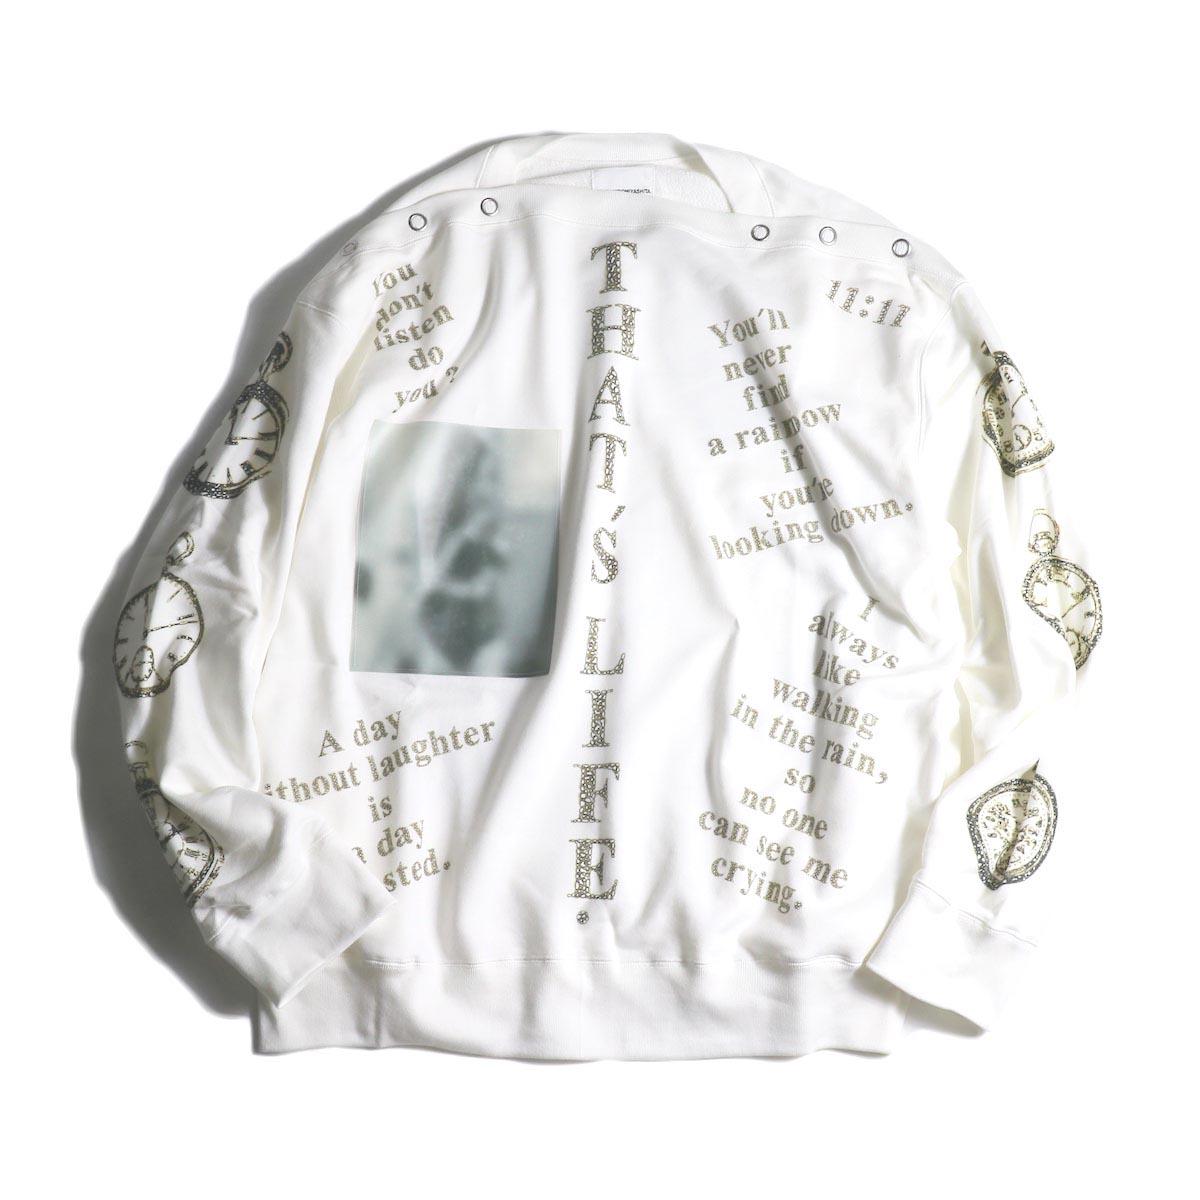 The Soloist / sc.0001aAW20 shoulder buttoned boat neck sweatshirt.